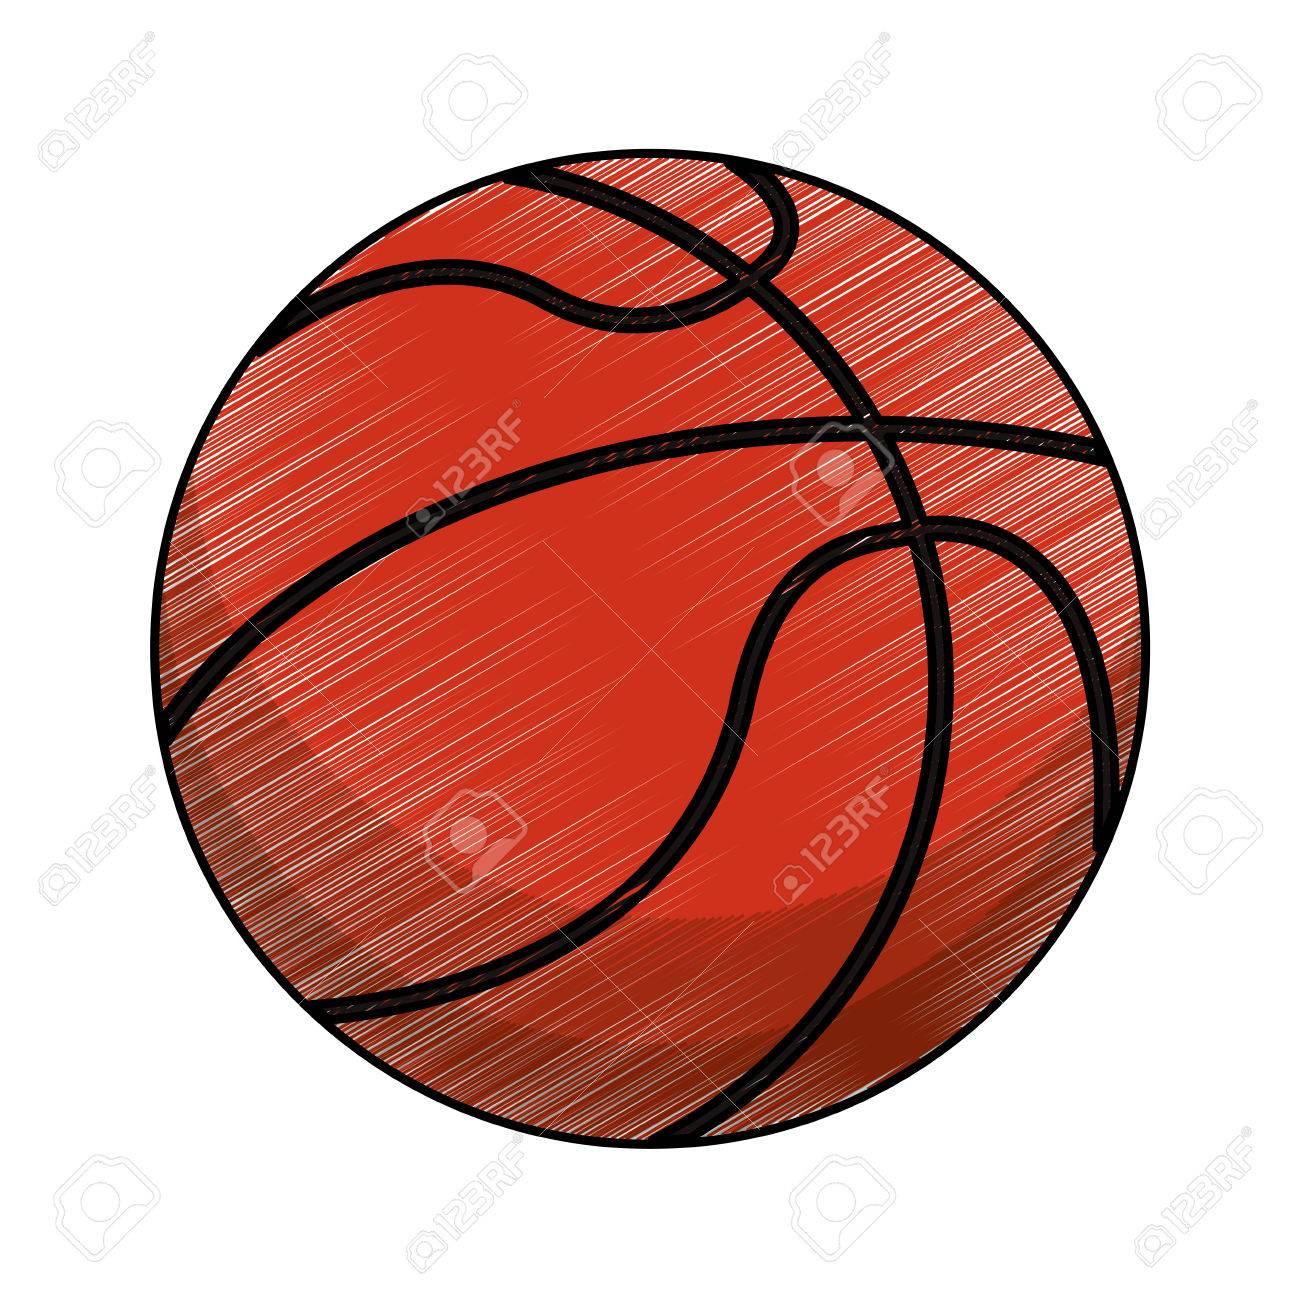 1300x1300 Drawing Basketball Ball Equipment Vector Illustration Eps 10